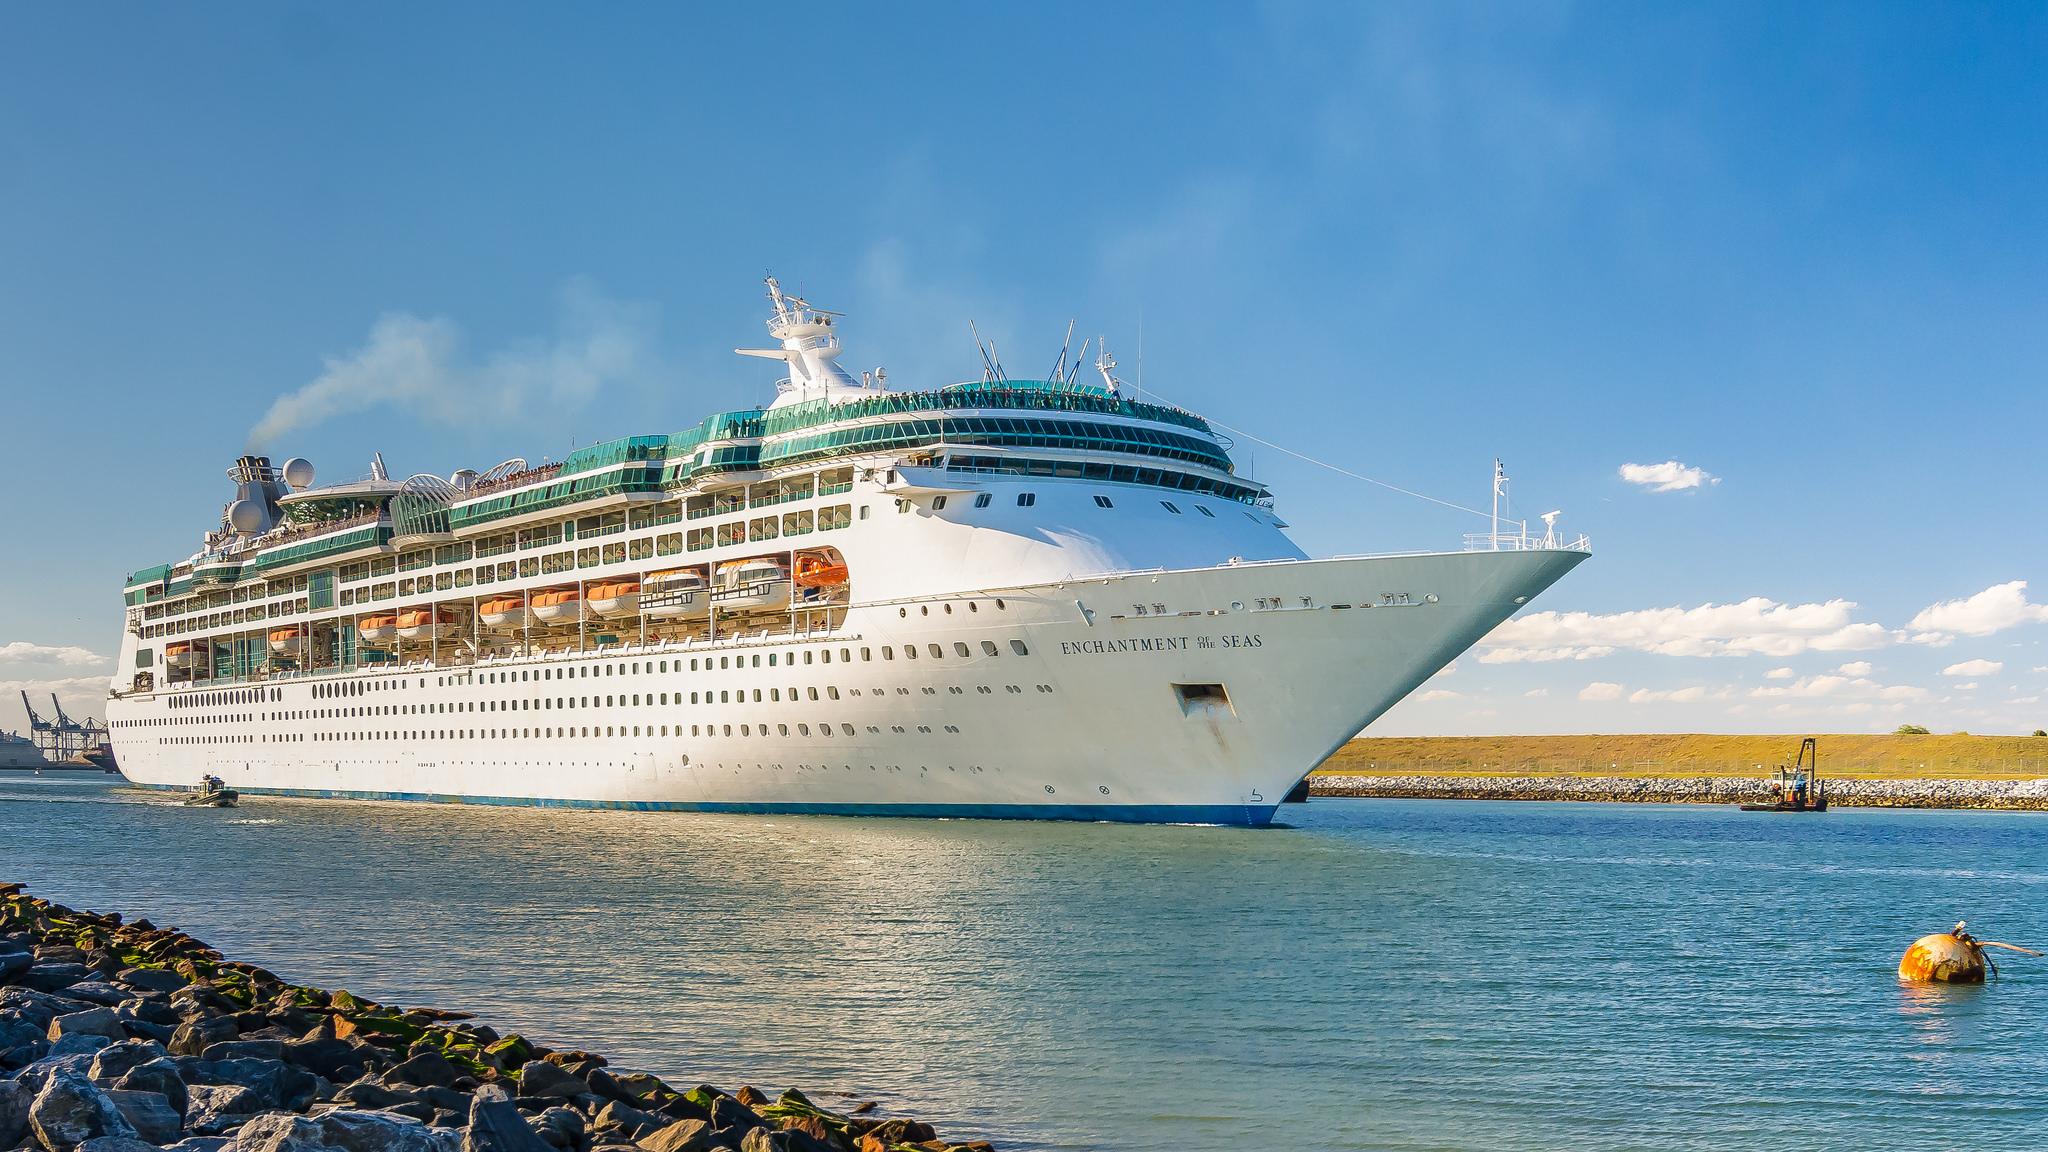 Cruise Ship Hd Wallpaper Background Image 2048x1152 Id959652